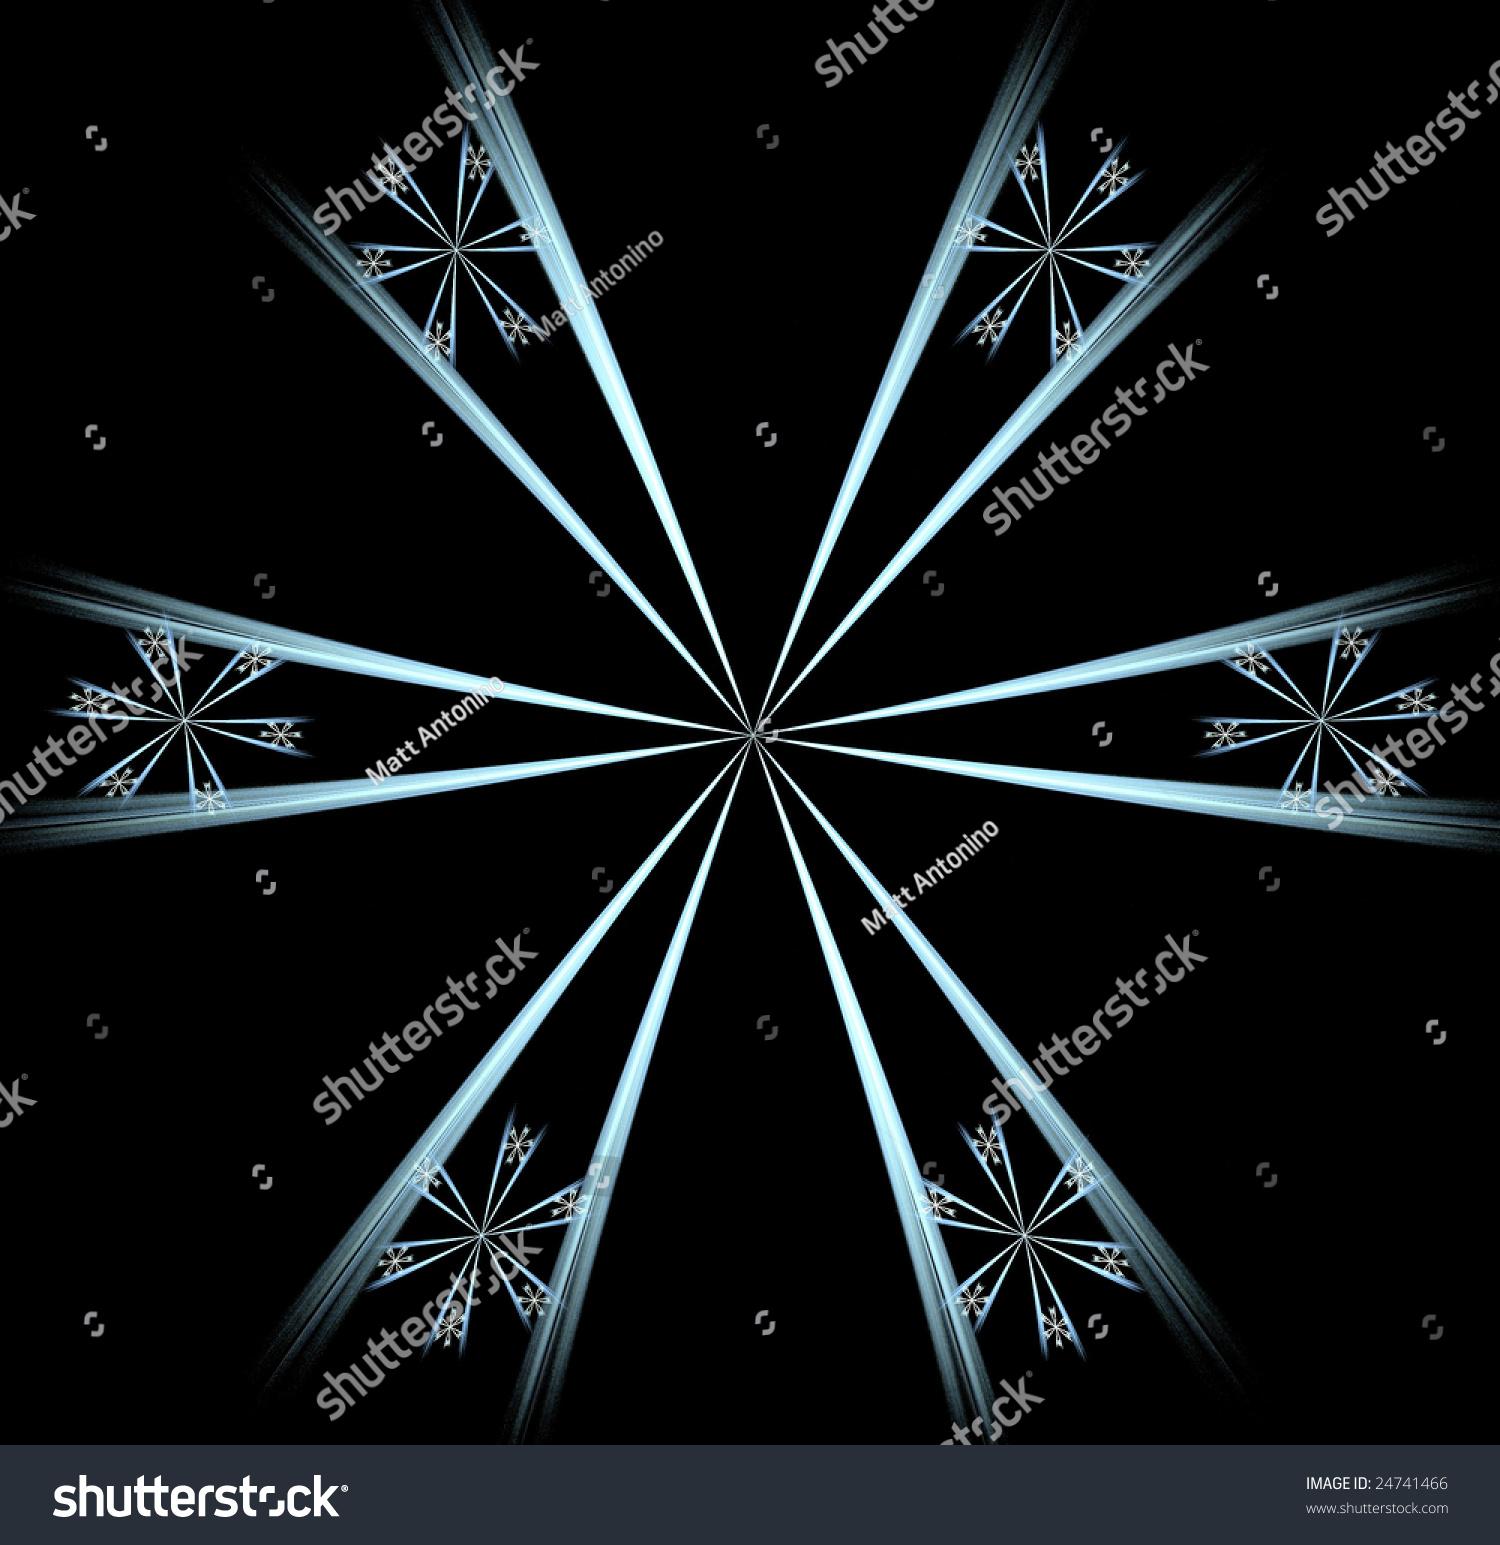 Blue Abstract Fractal Wallpaper Design Over A Black